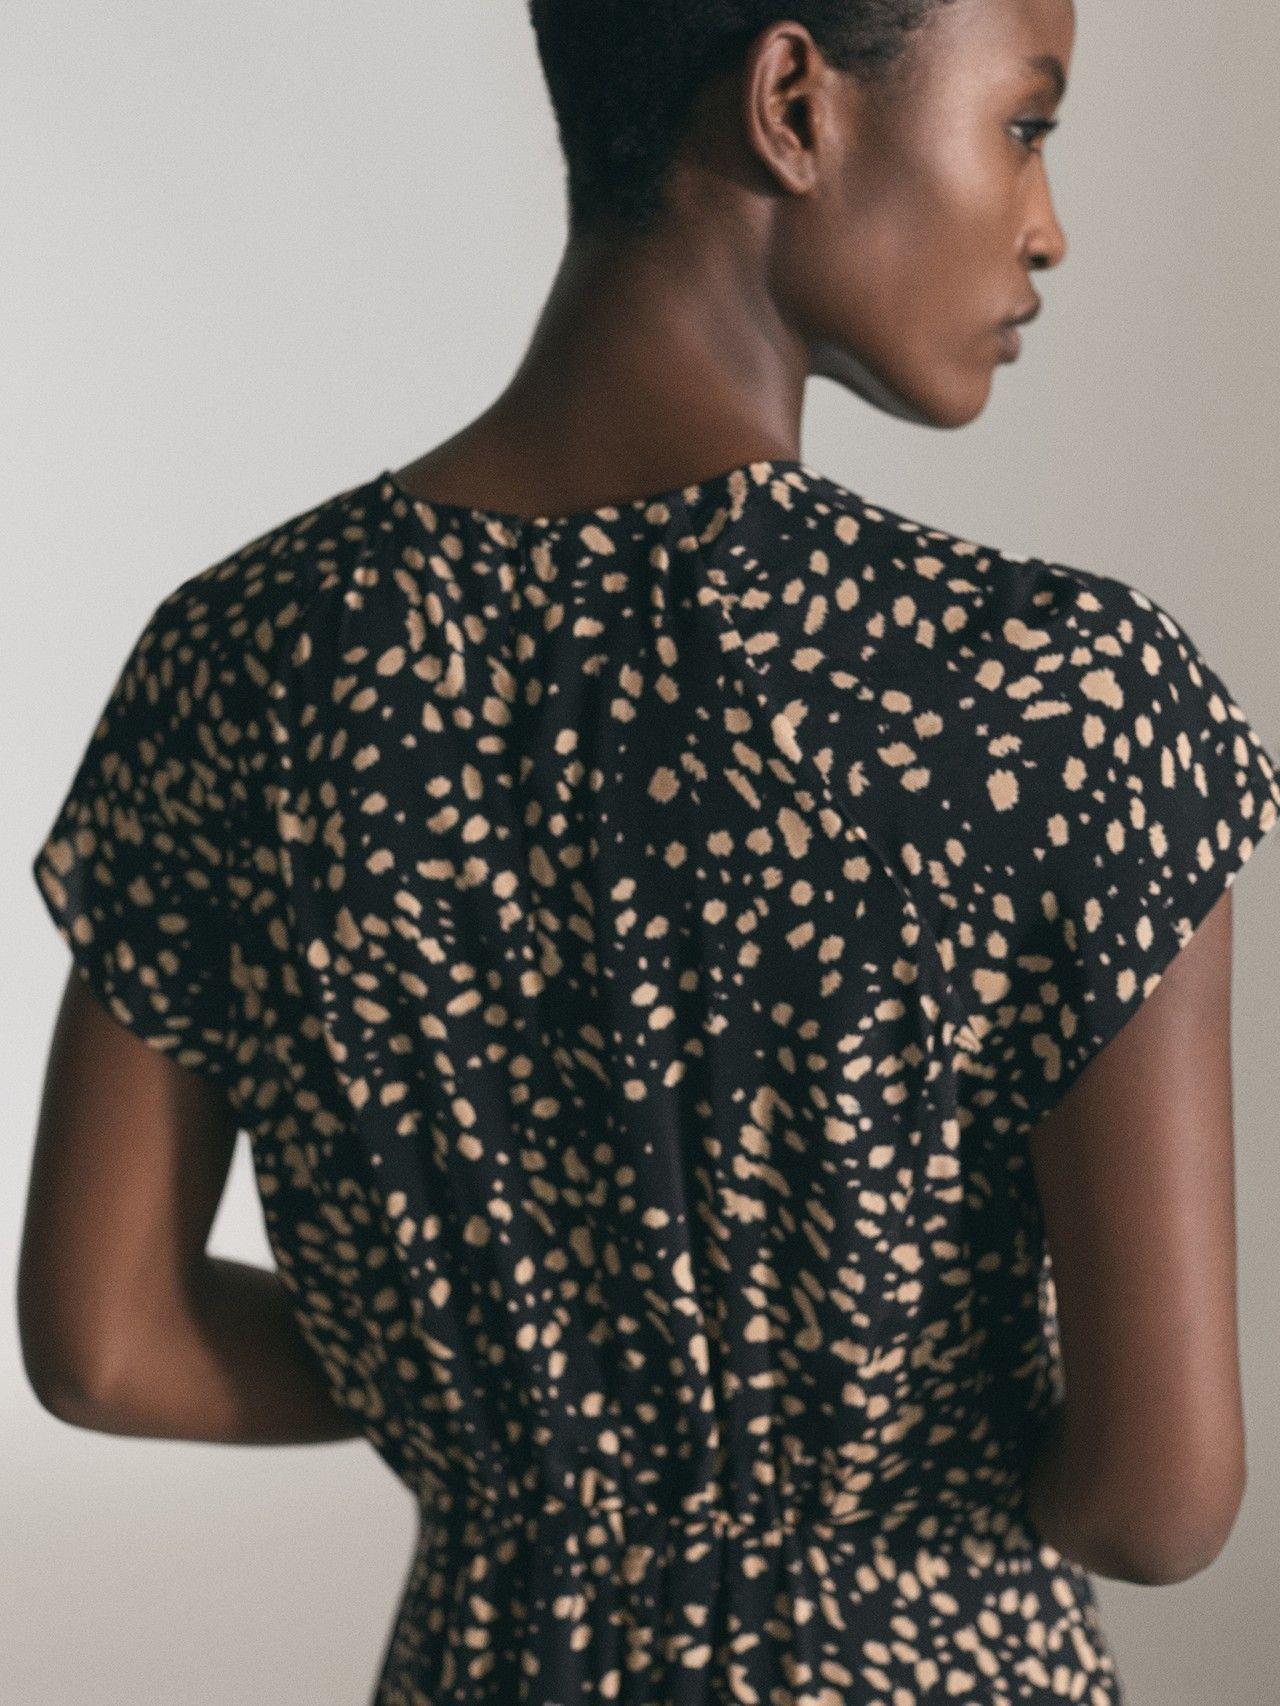 Pin de Araceli Díaz en VeStIdO en 2020 | Camisa negra